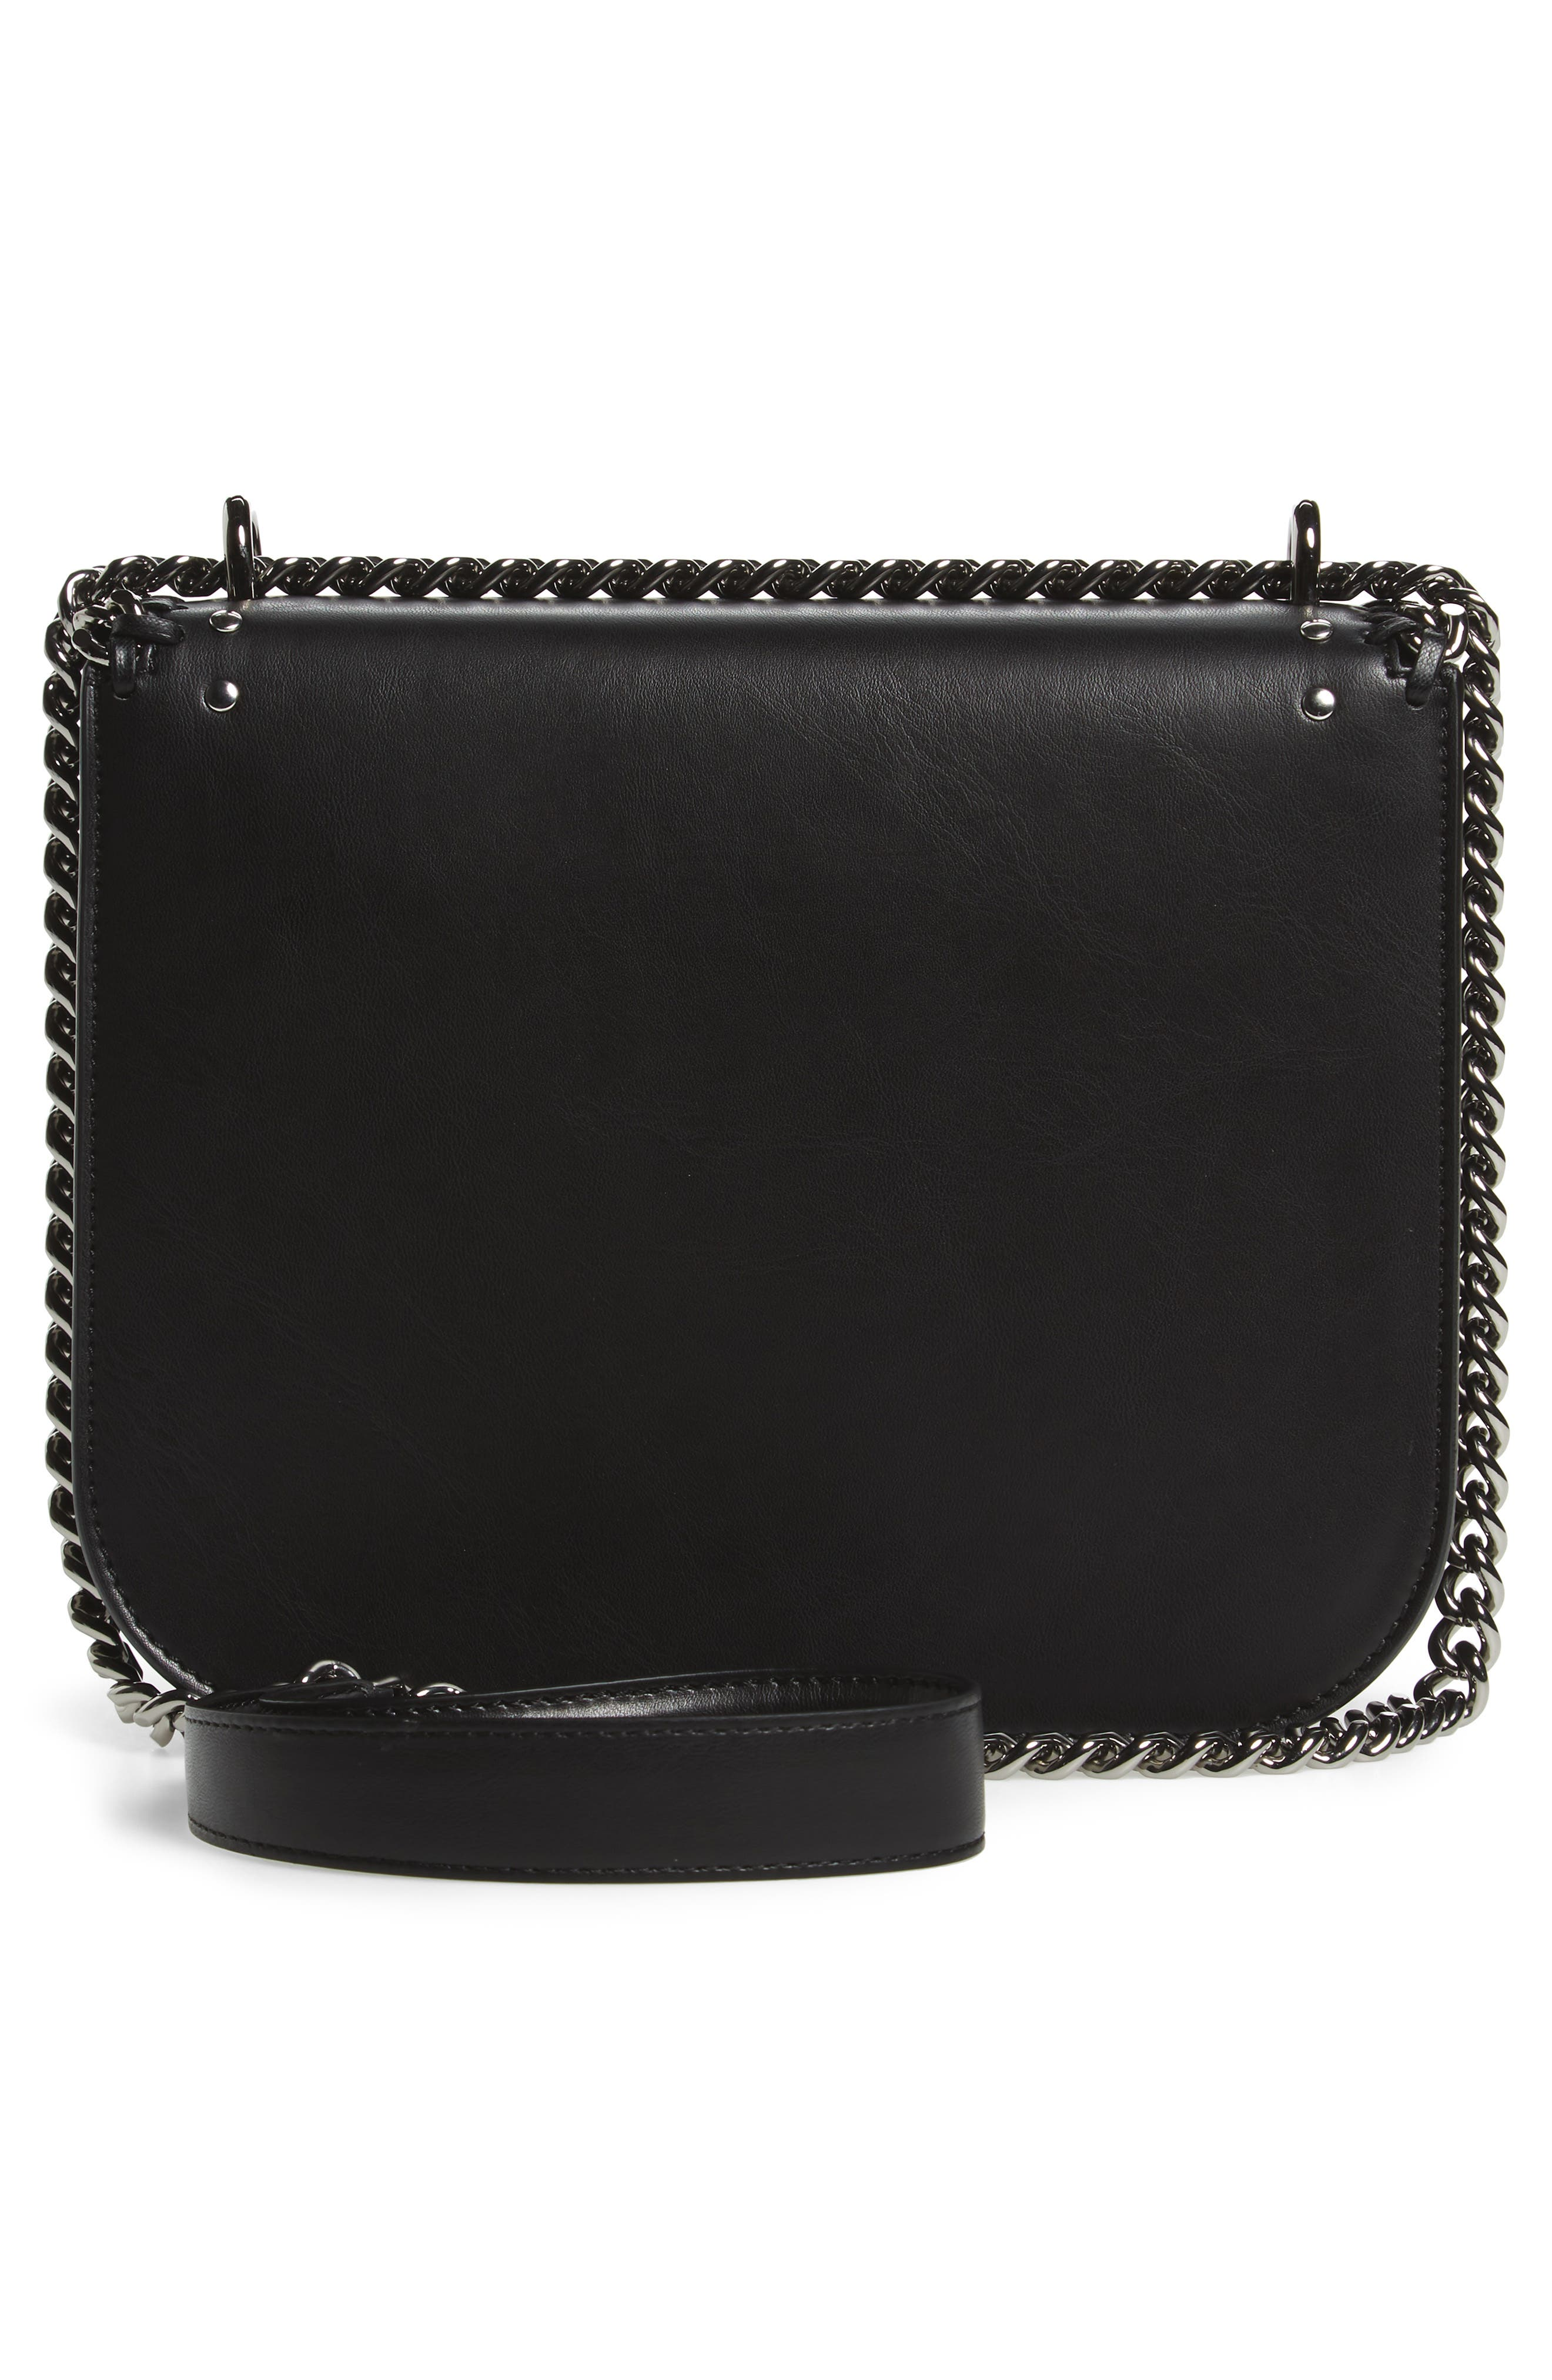 Medium Falabella Box Floral Shoulder Bag,                             Alternate thumbnail 3, color,                             Black